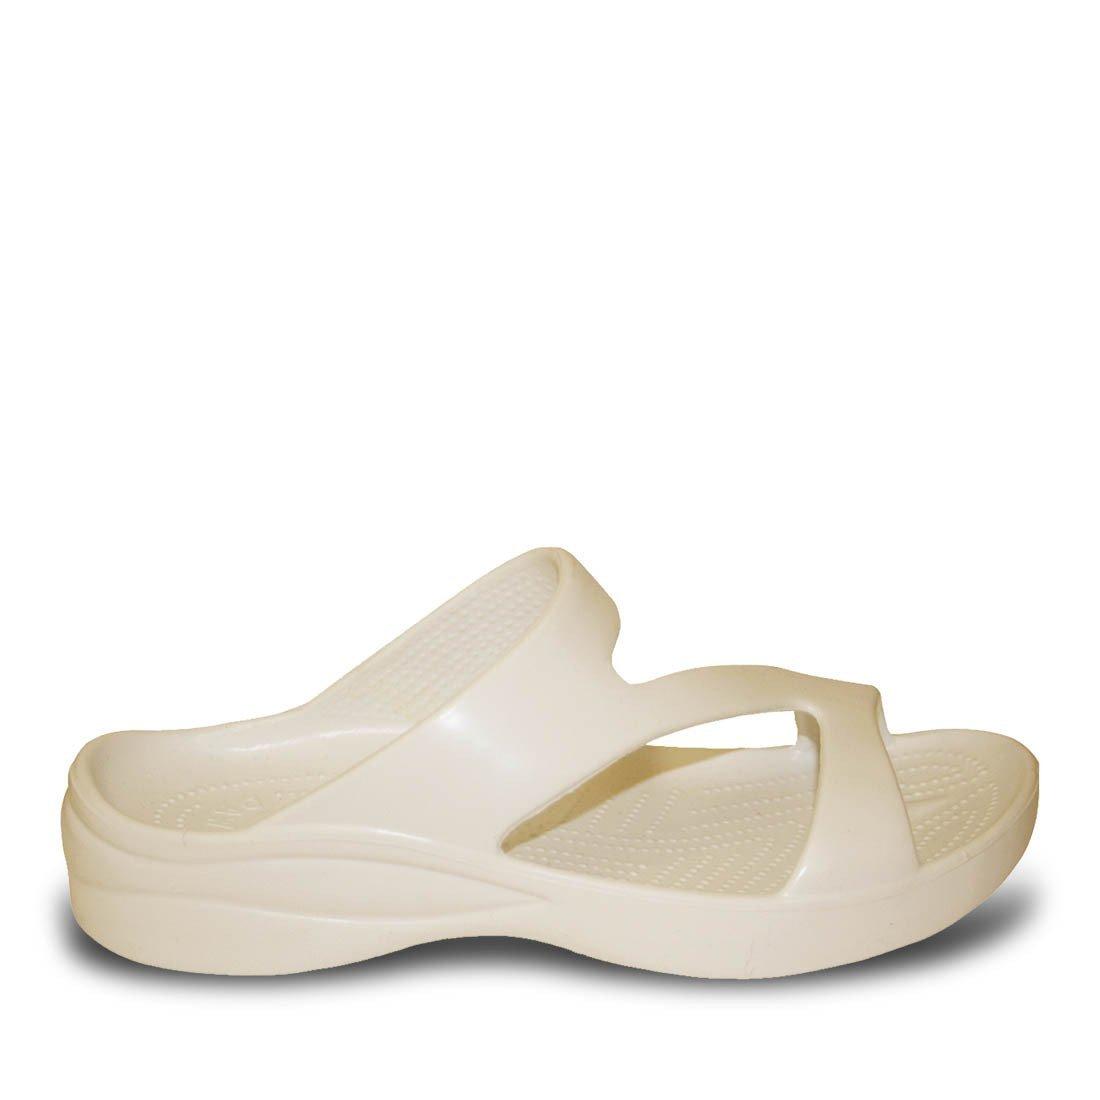 Image of Women's Z Sandals - Tan